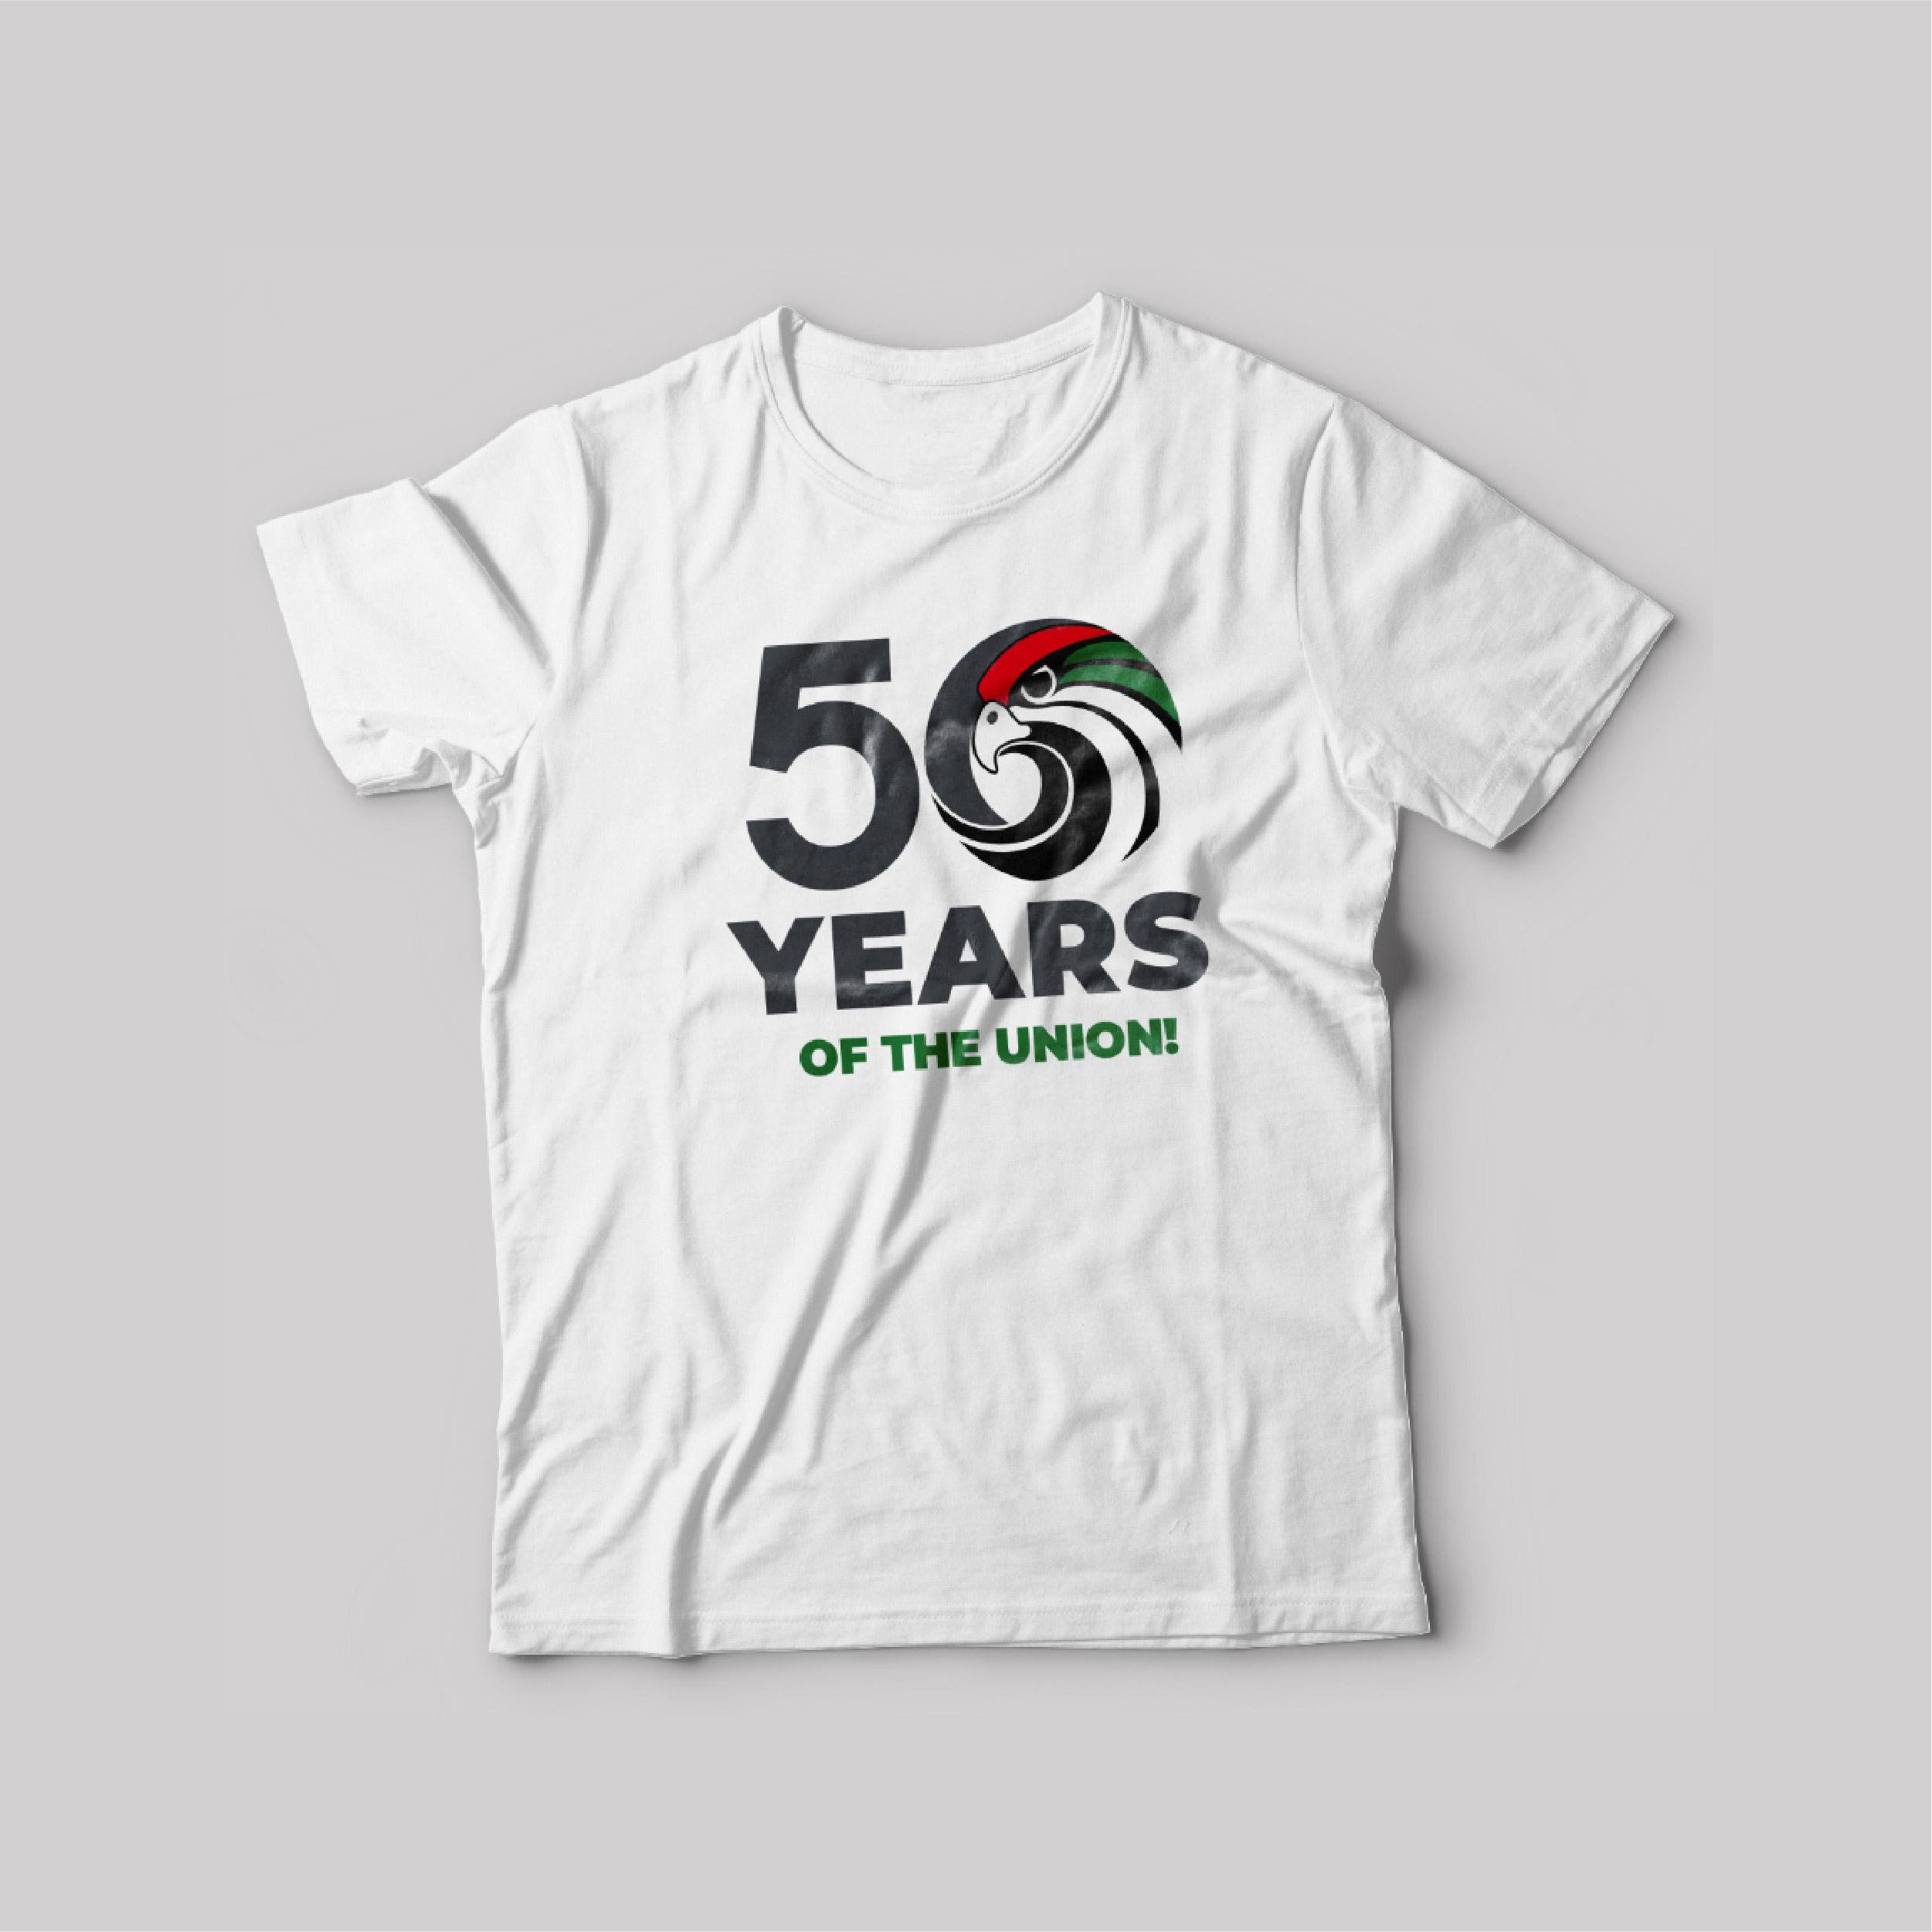 UAE National day T-Shirt White Round Neck For Unisex 50 years of Union